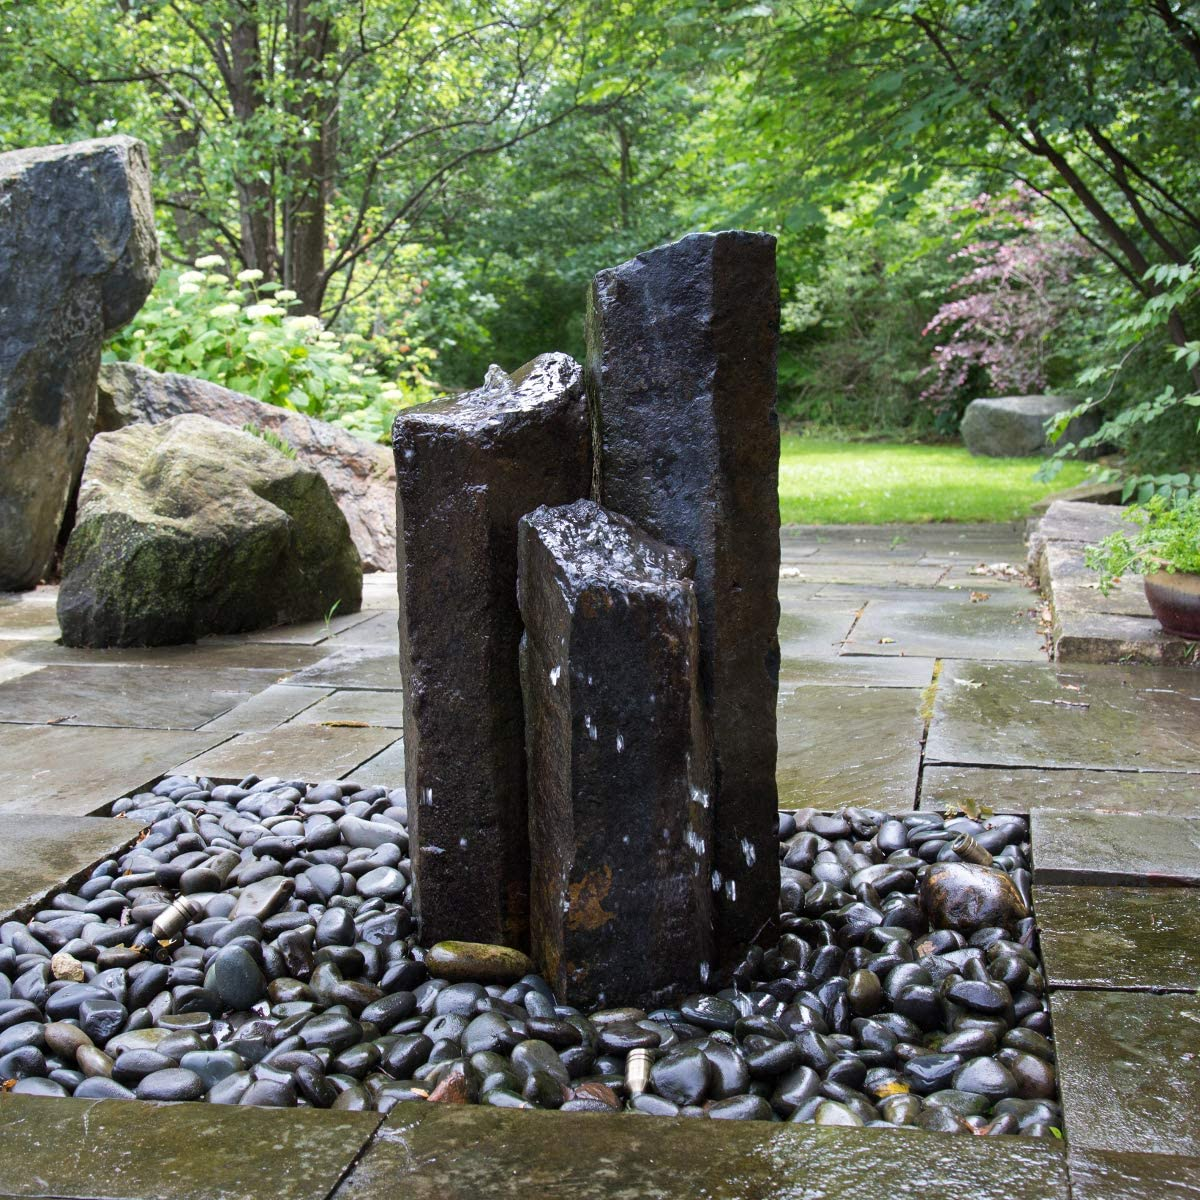 Aquascape Mongolian Basalt Stone Fountain Columns Set Of 3 24 Inch 30 Inch 36 Inch 58062 Amazon Ca Patio Lawn Garden